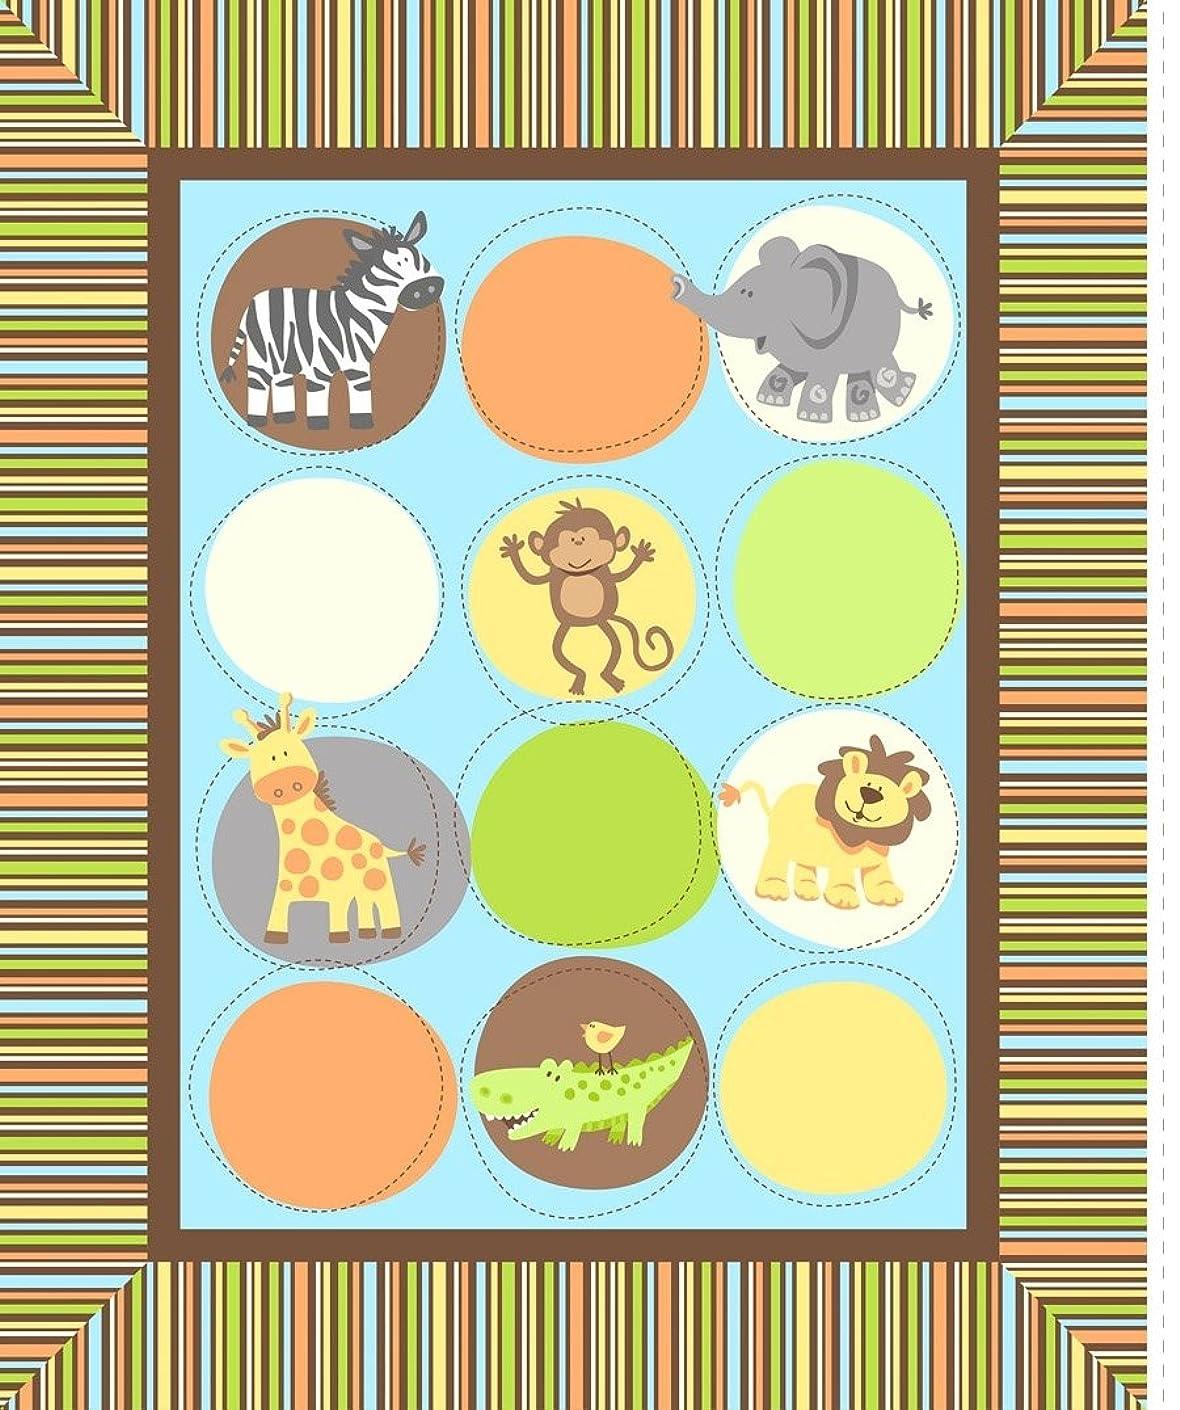 Springs Creative Products Group Safari Tots Nursery Blanket Kit, Multi-Colored